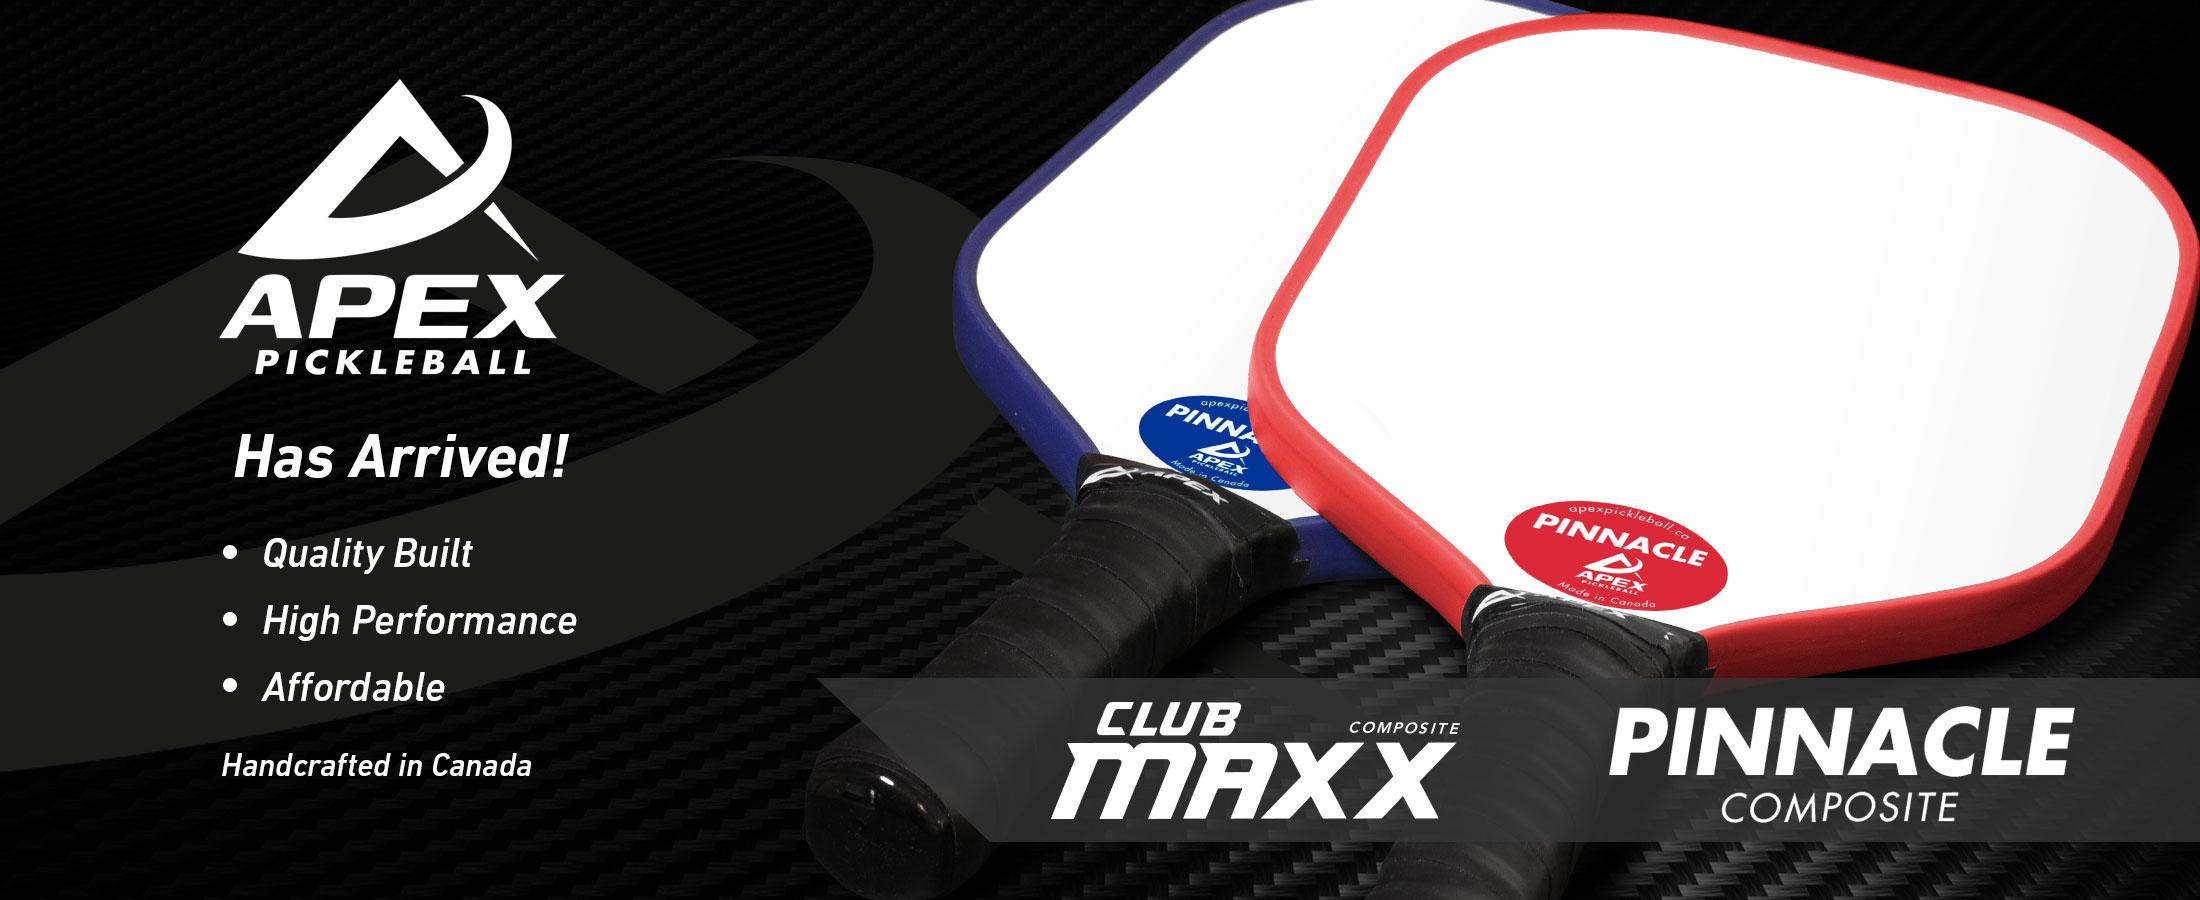 Club-Maxx and Pinnacle – Apex Pickleball Paddles